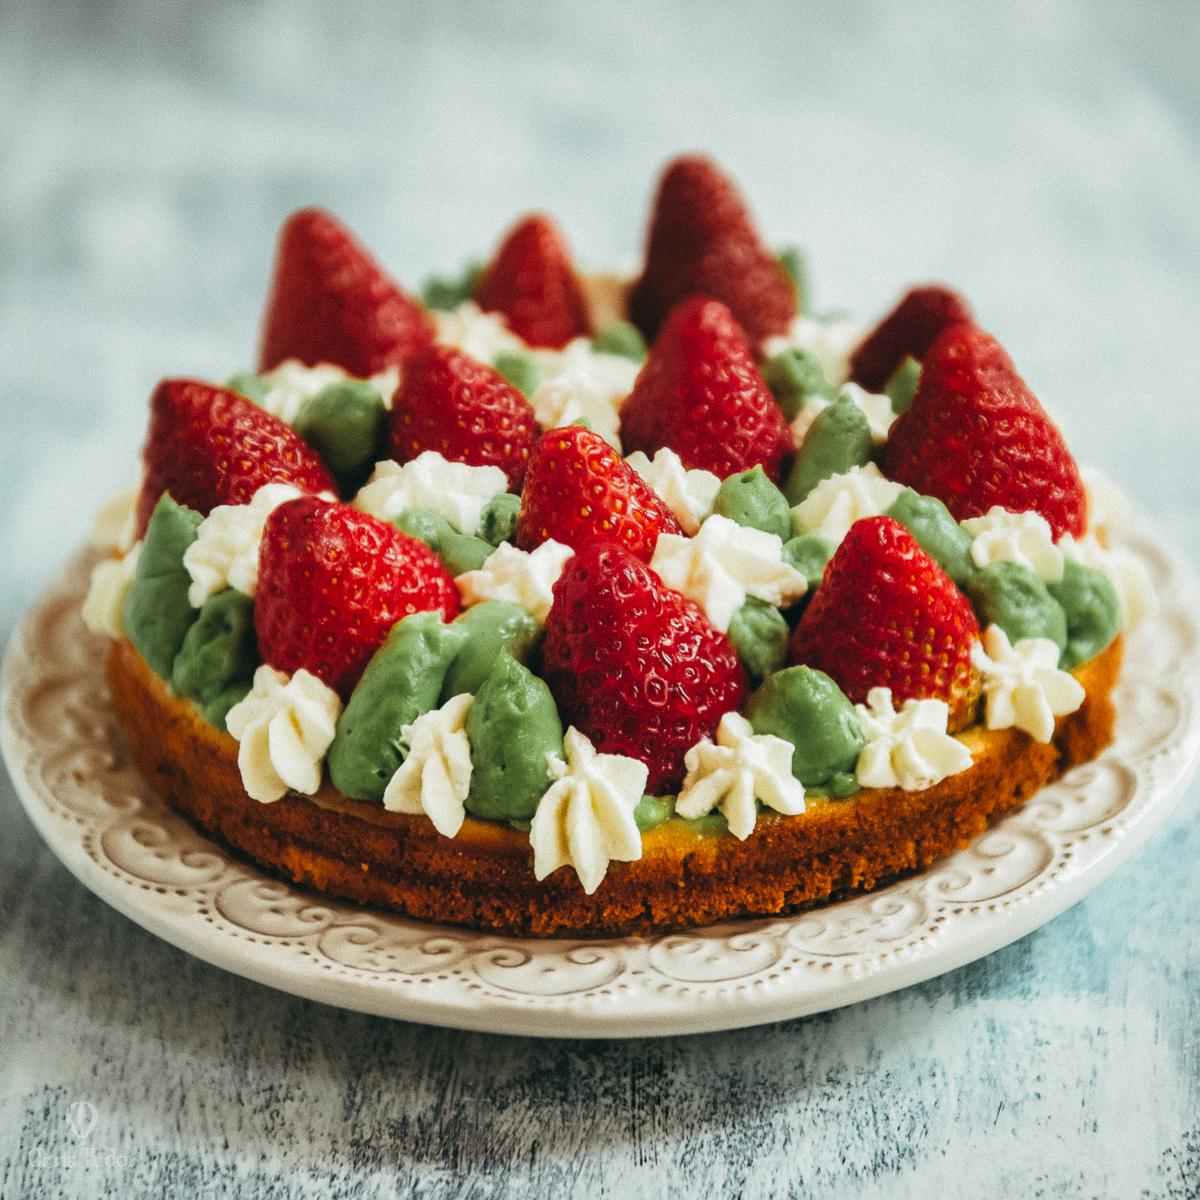 cristina-tudor-food-photography (15).jpg